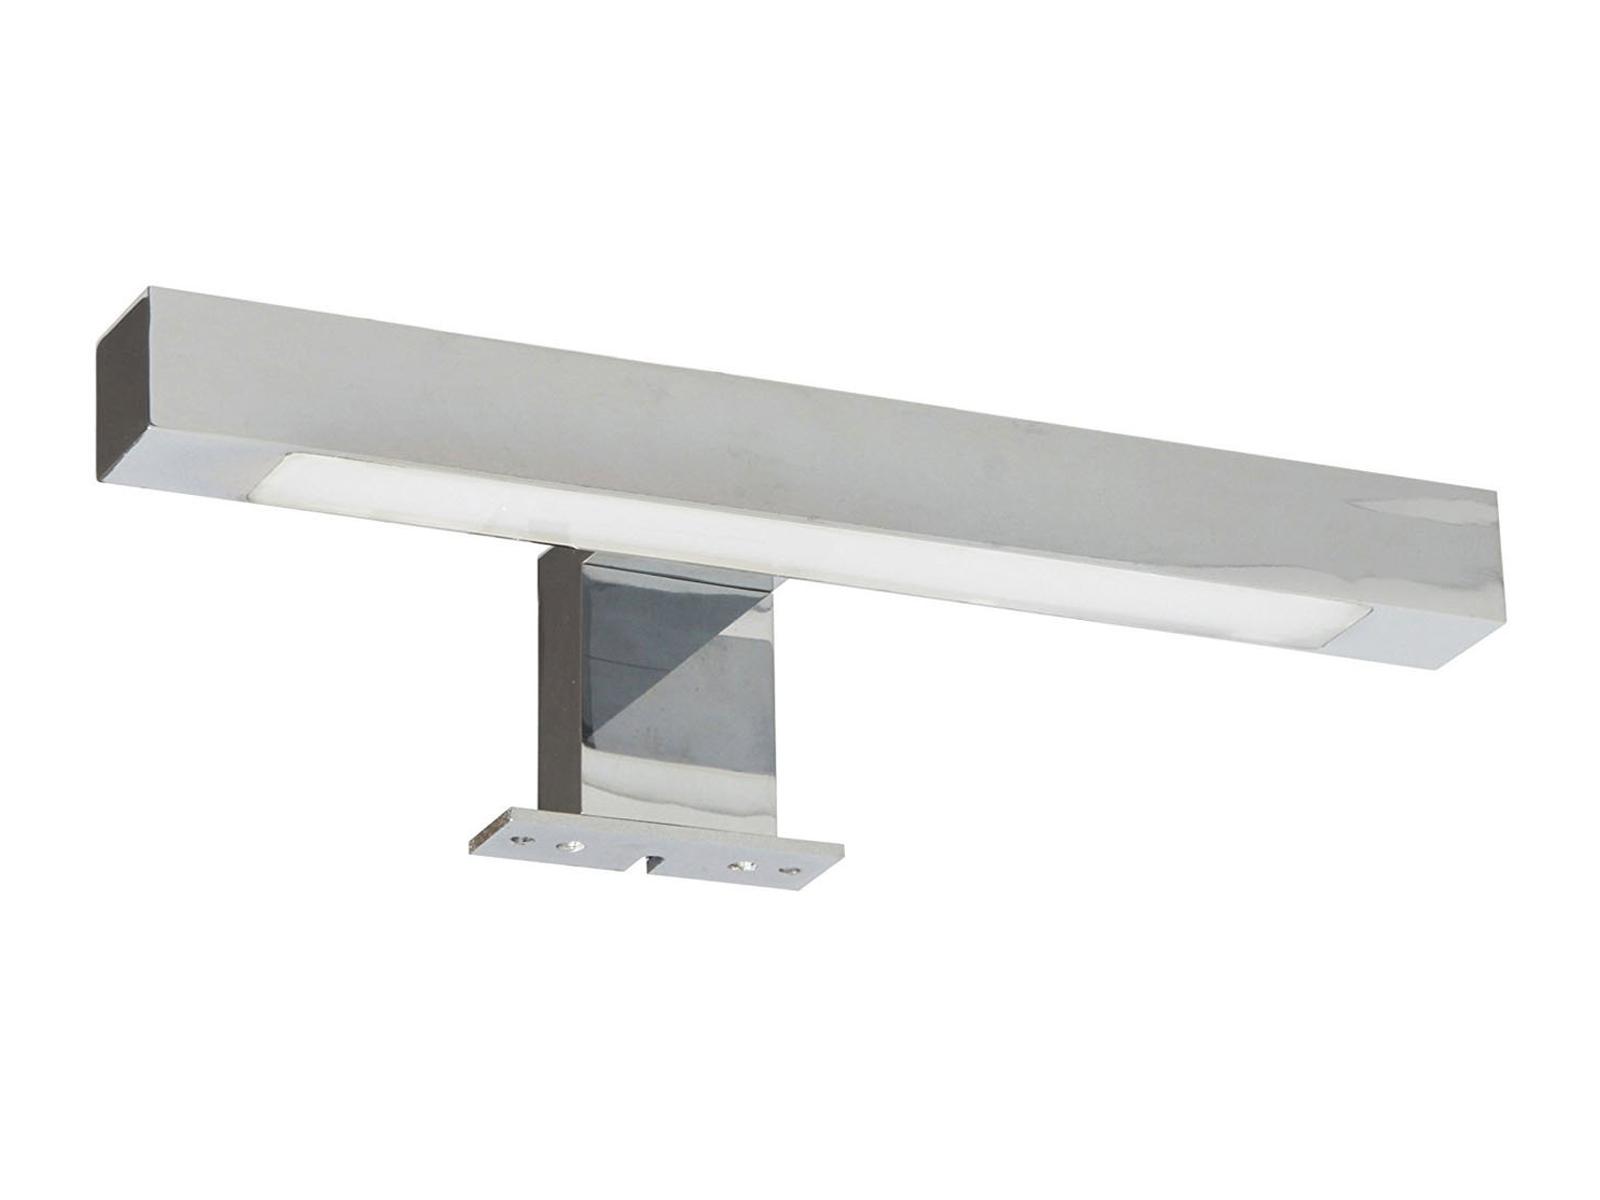 led spiegelleuchte 30cm f rs badezimmer spiegellampe ip44. Black Bedroom Furniture Sets. Home Design Ideas